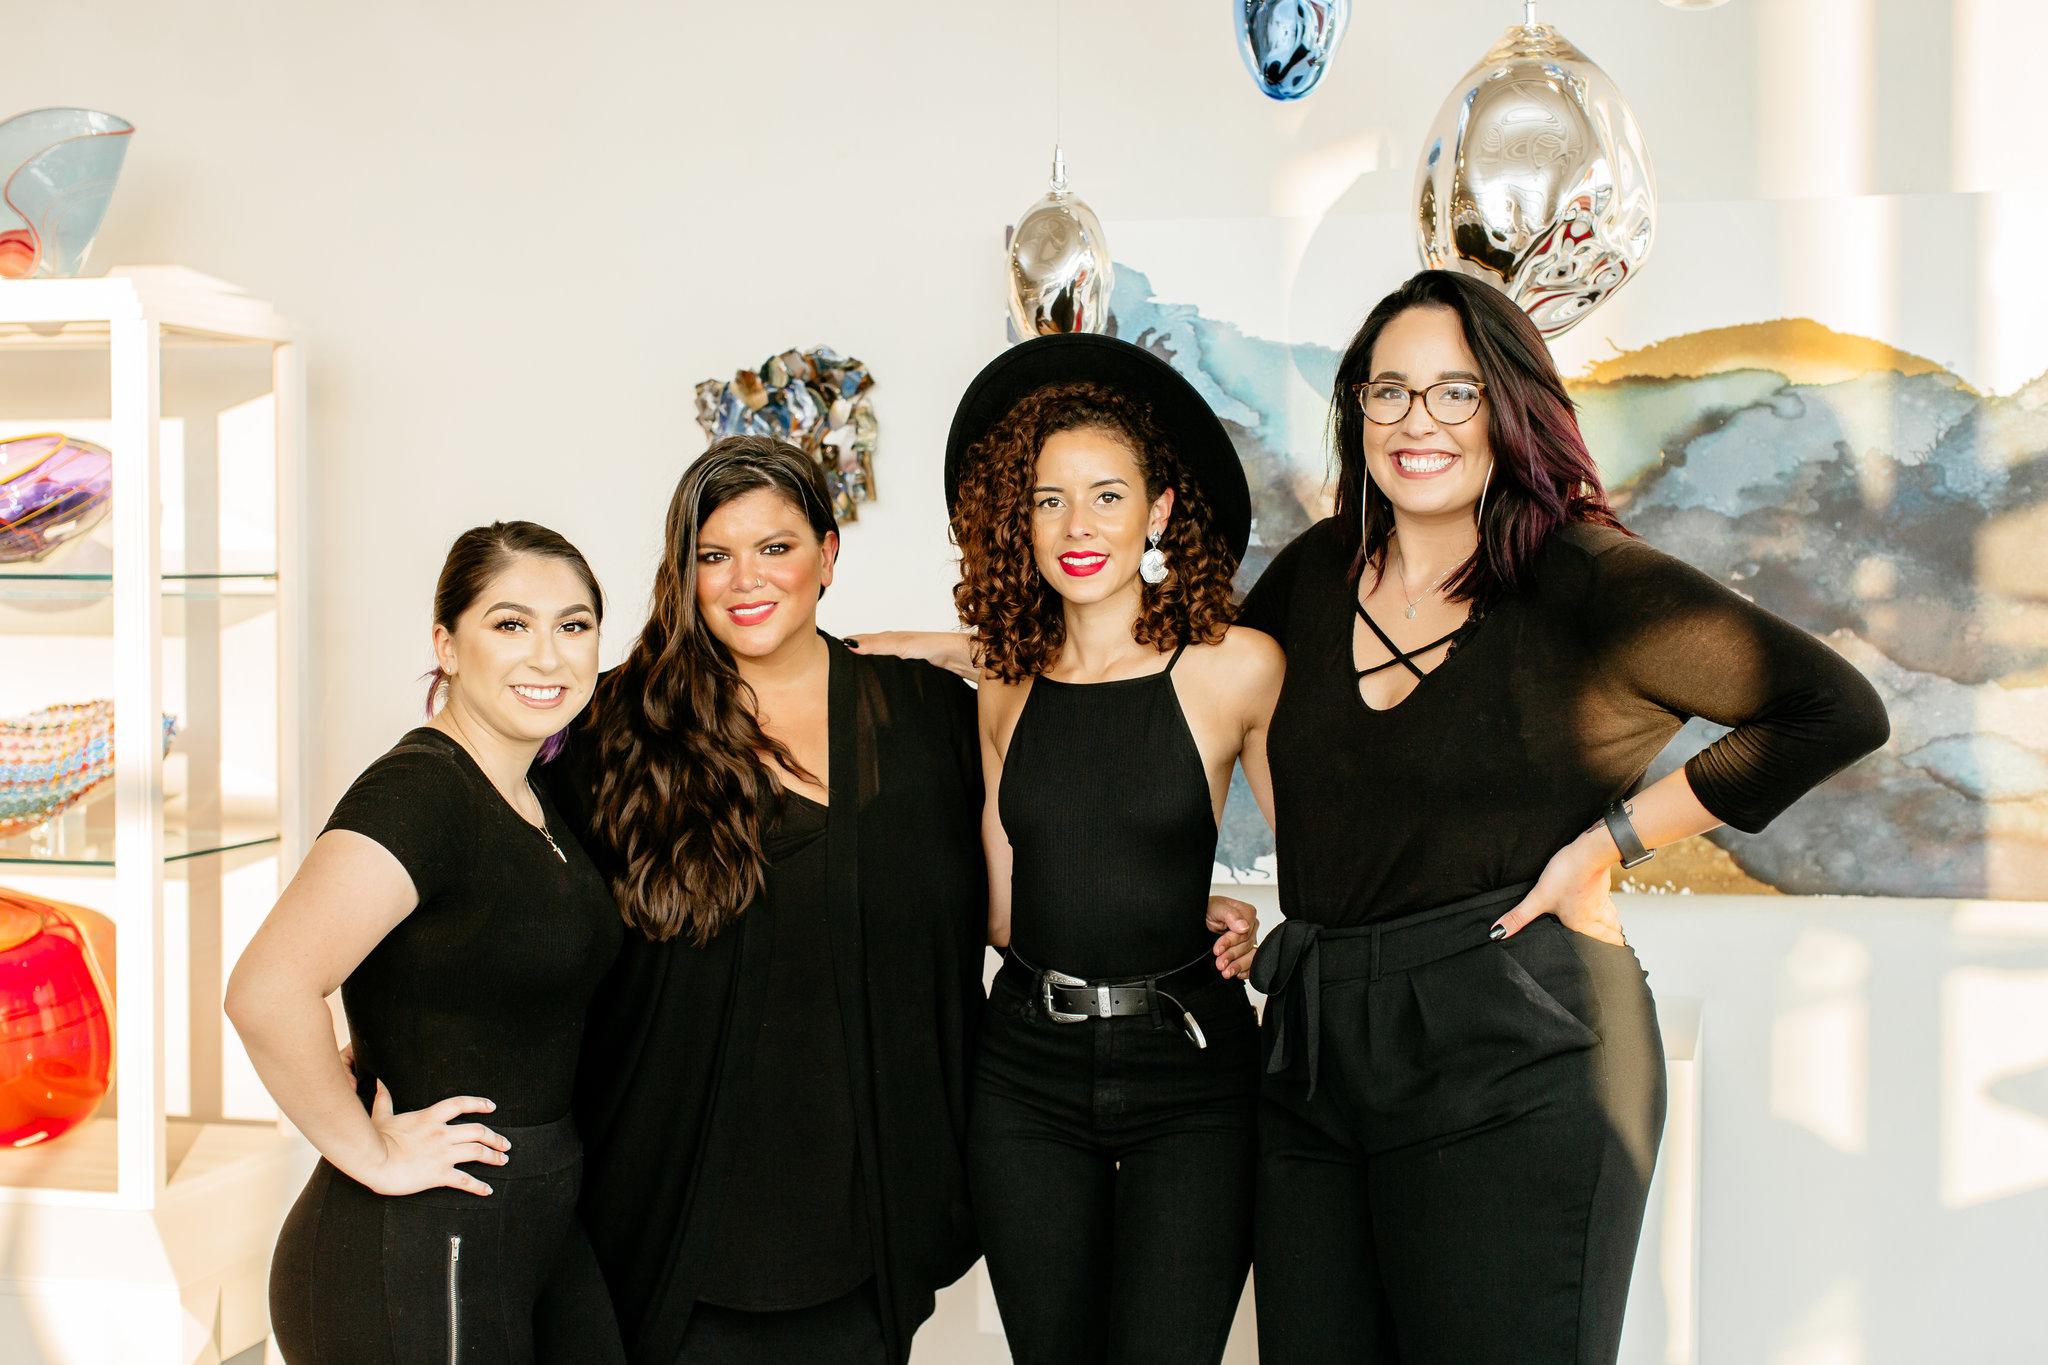 Alexa-Vossler-Photo_Dallas-Event-Photographer_Brite-Bar-Beauty-2018-Lipstick-Launch-Party-34.jpg